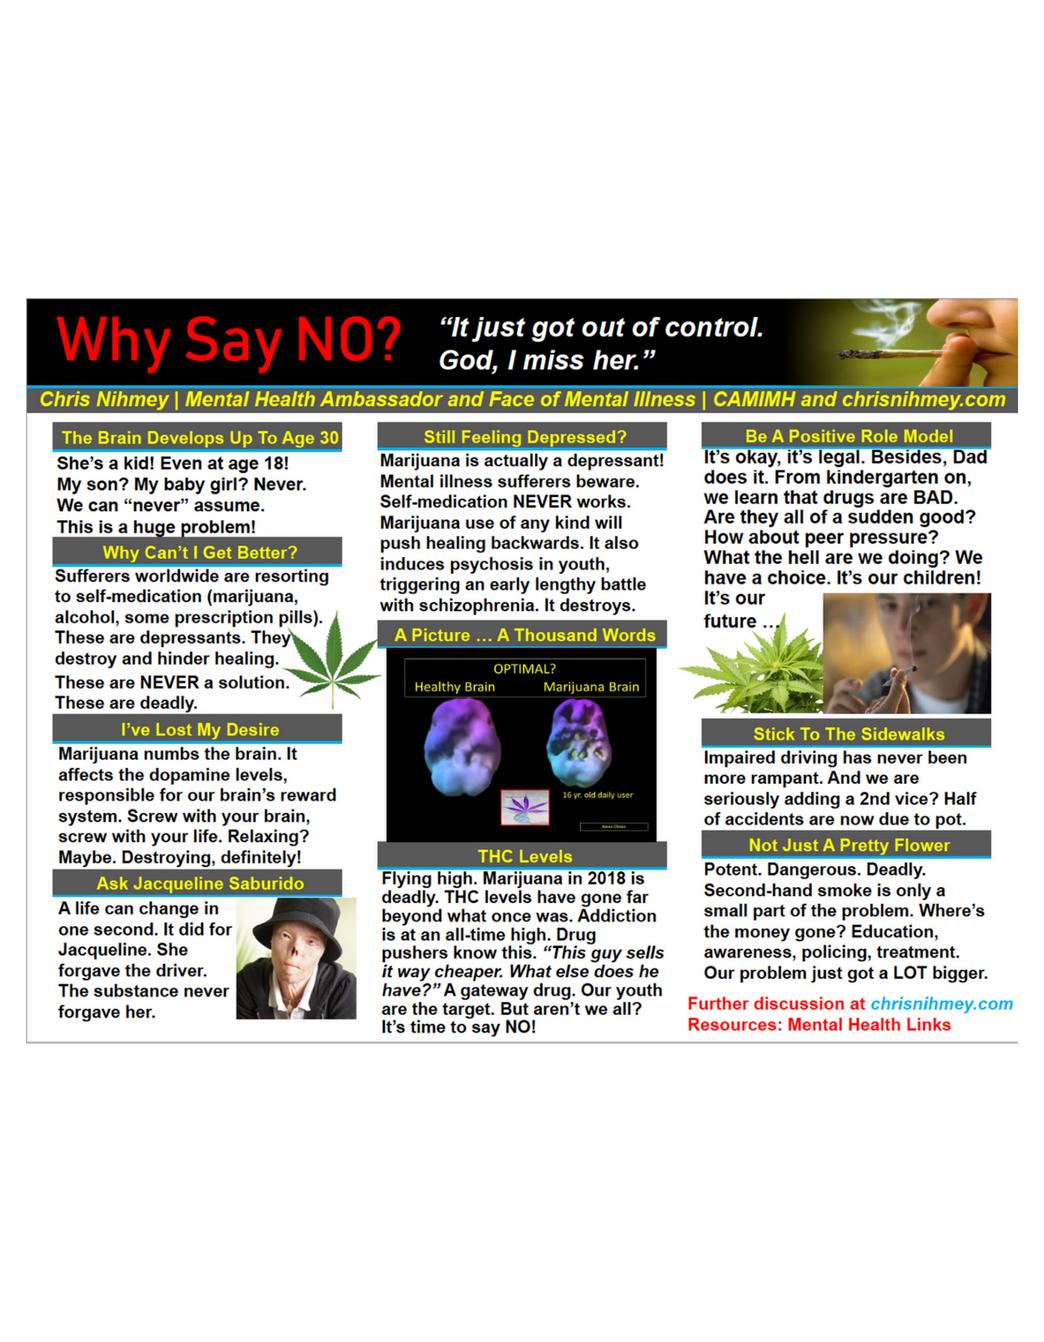 Anti-legalization Poster